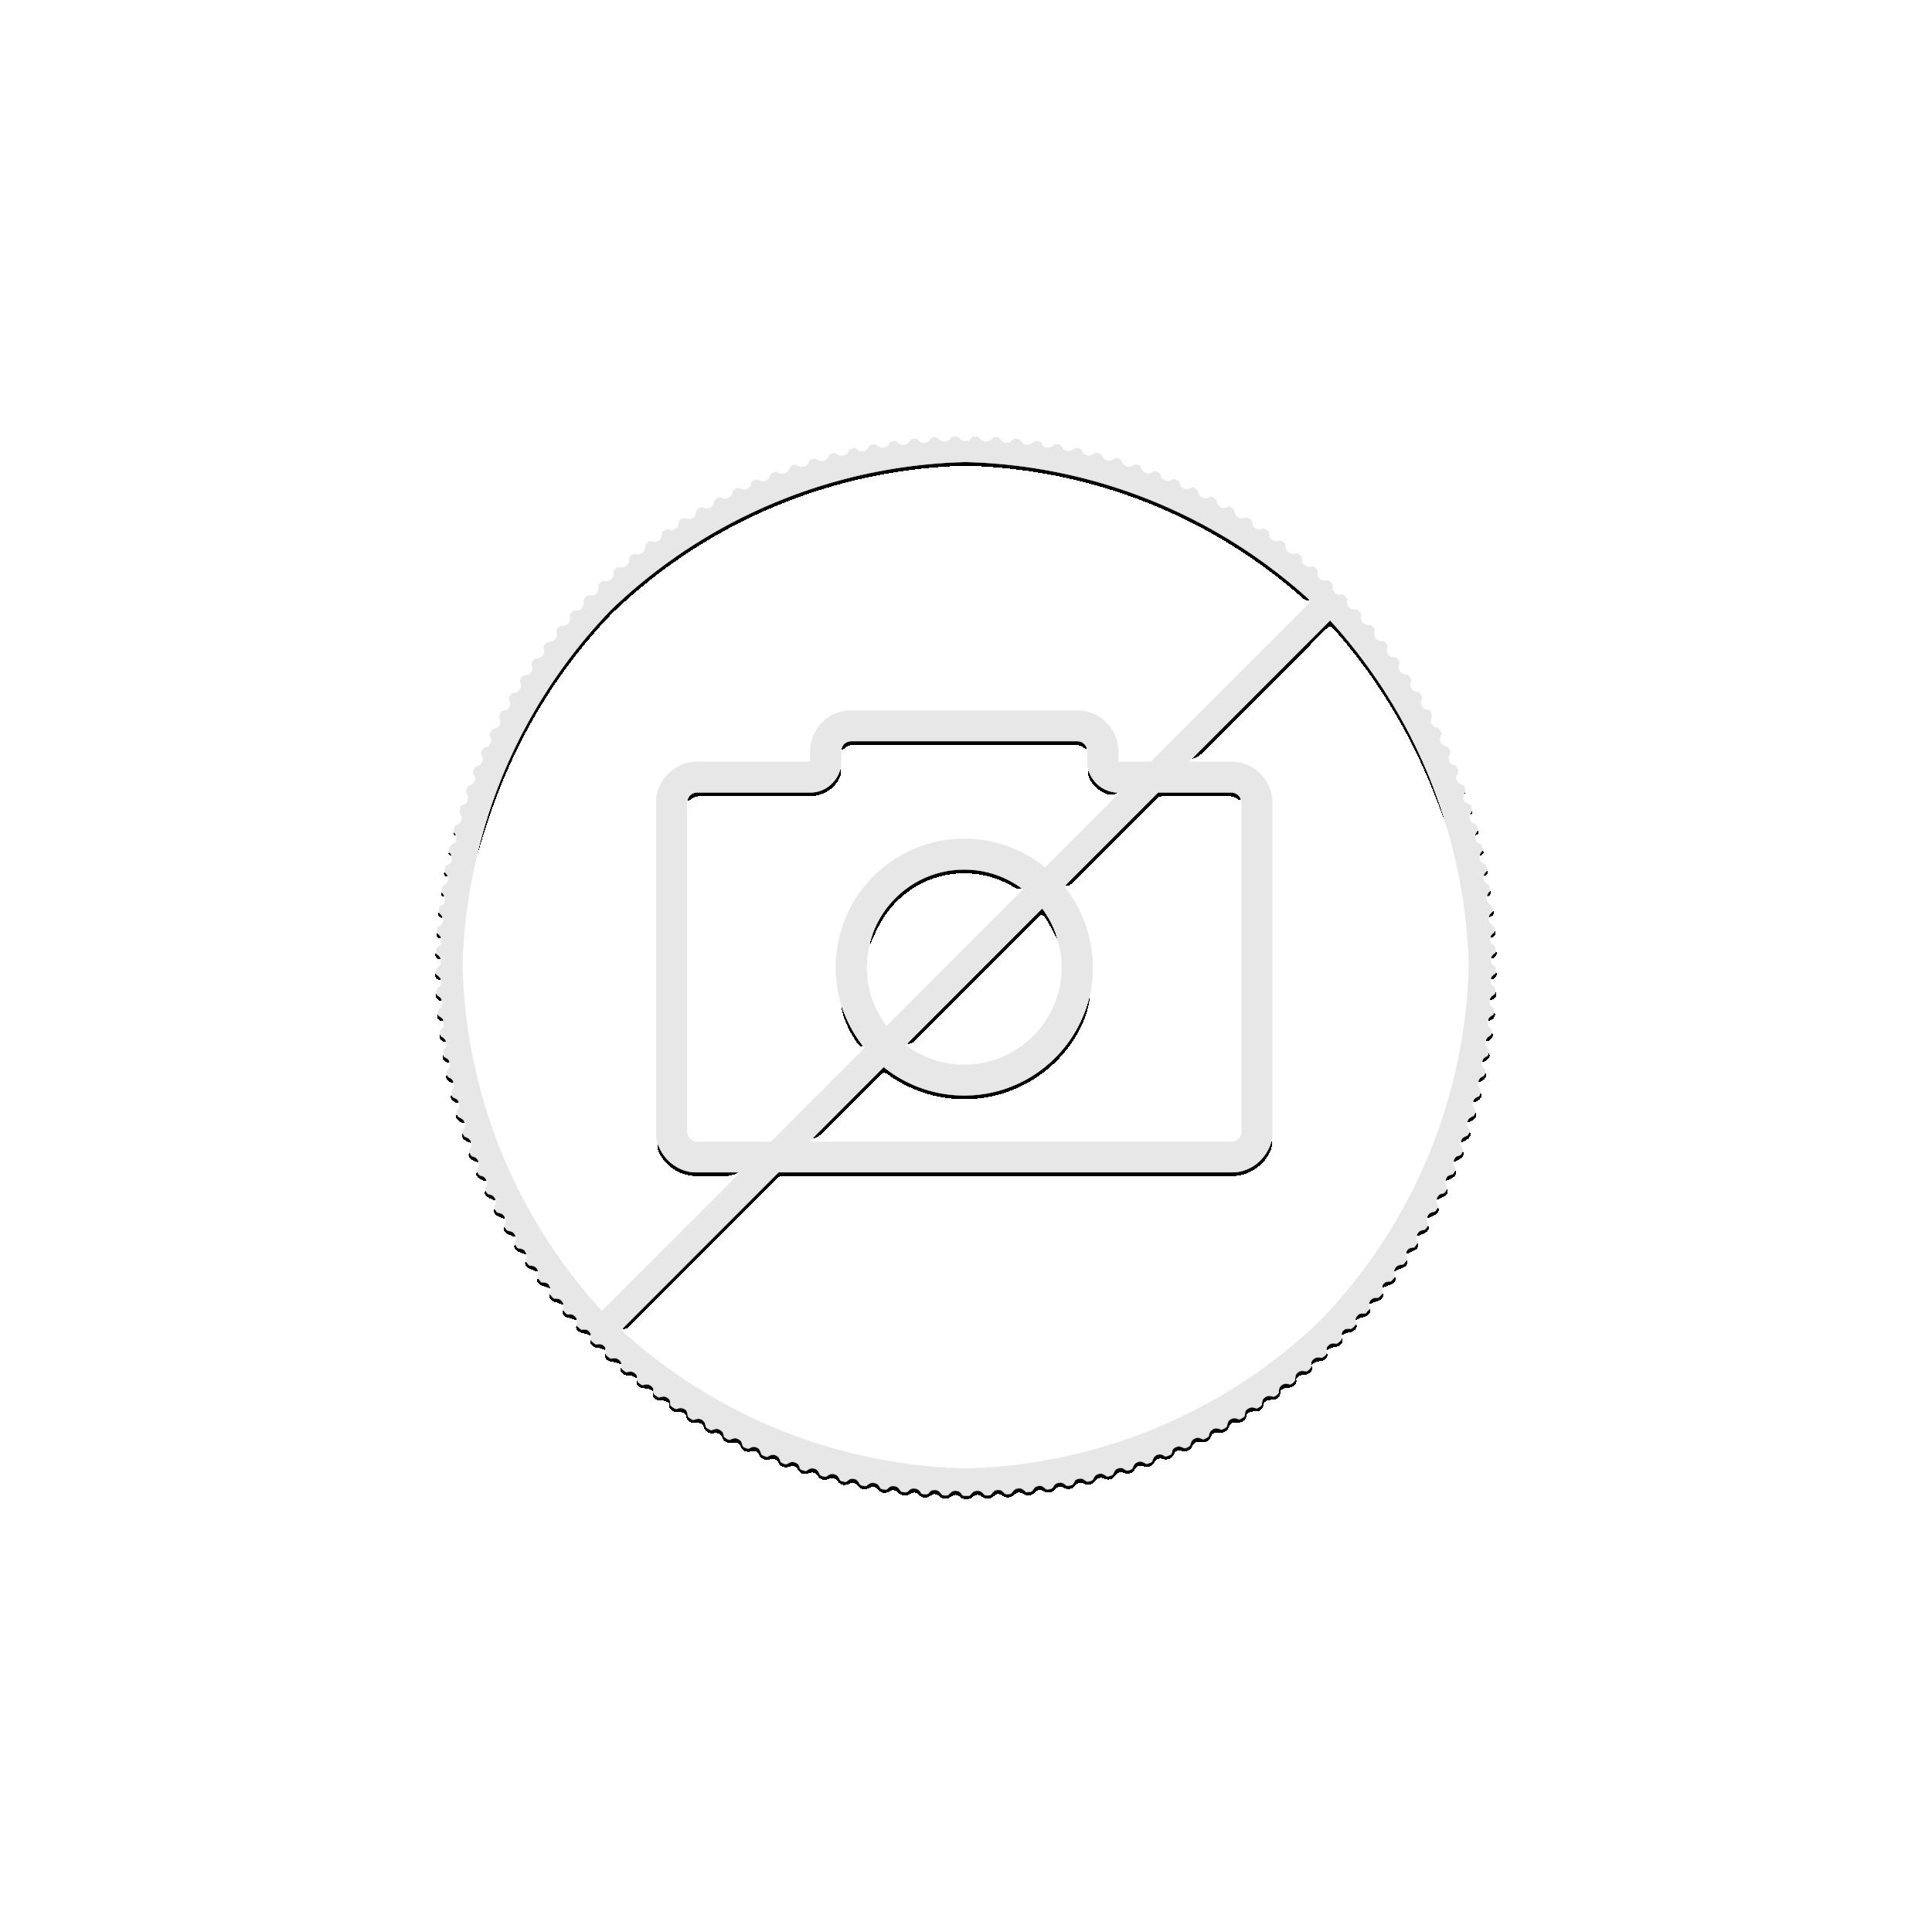 1 Troy ounce zilveren munt Krugerrand 2019 Proof